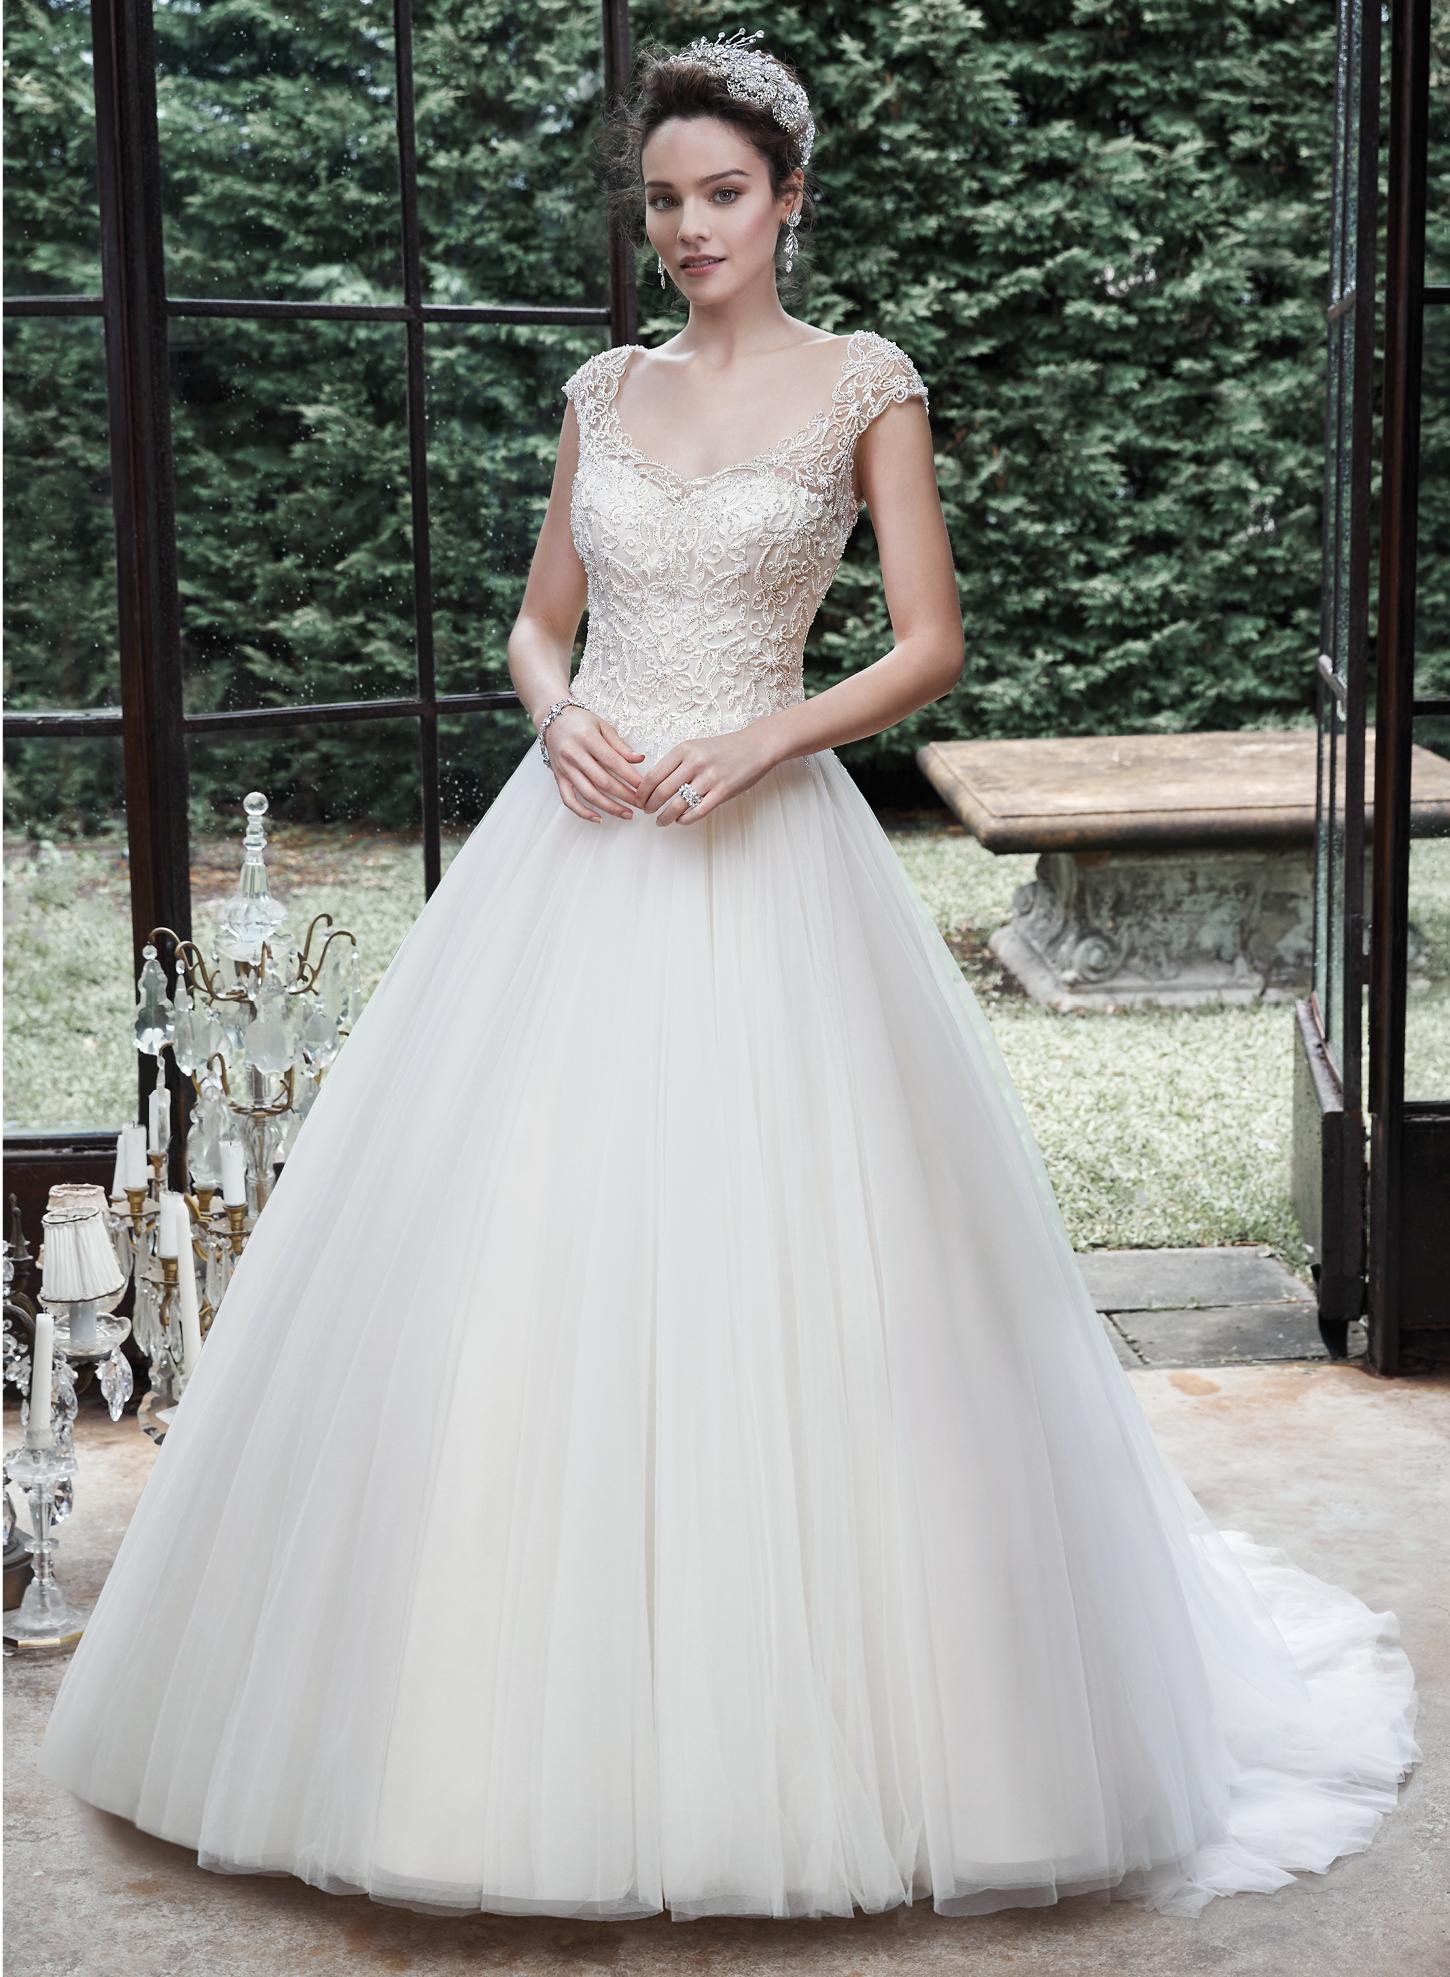 Alfred Angelo Discount Bridesmaid Dresses - Ocodea.com